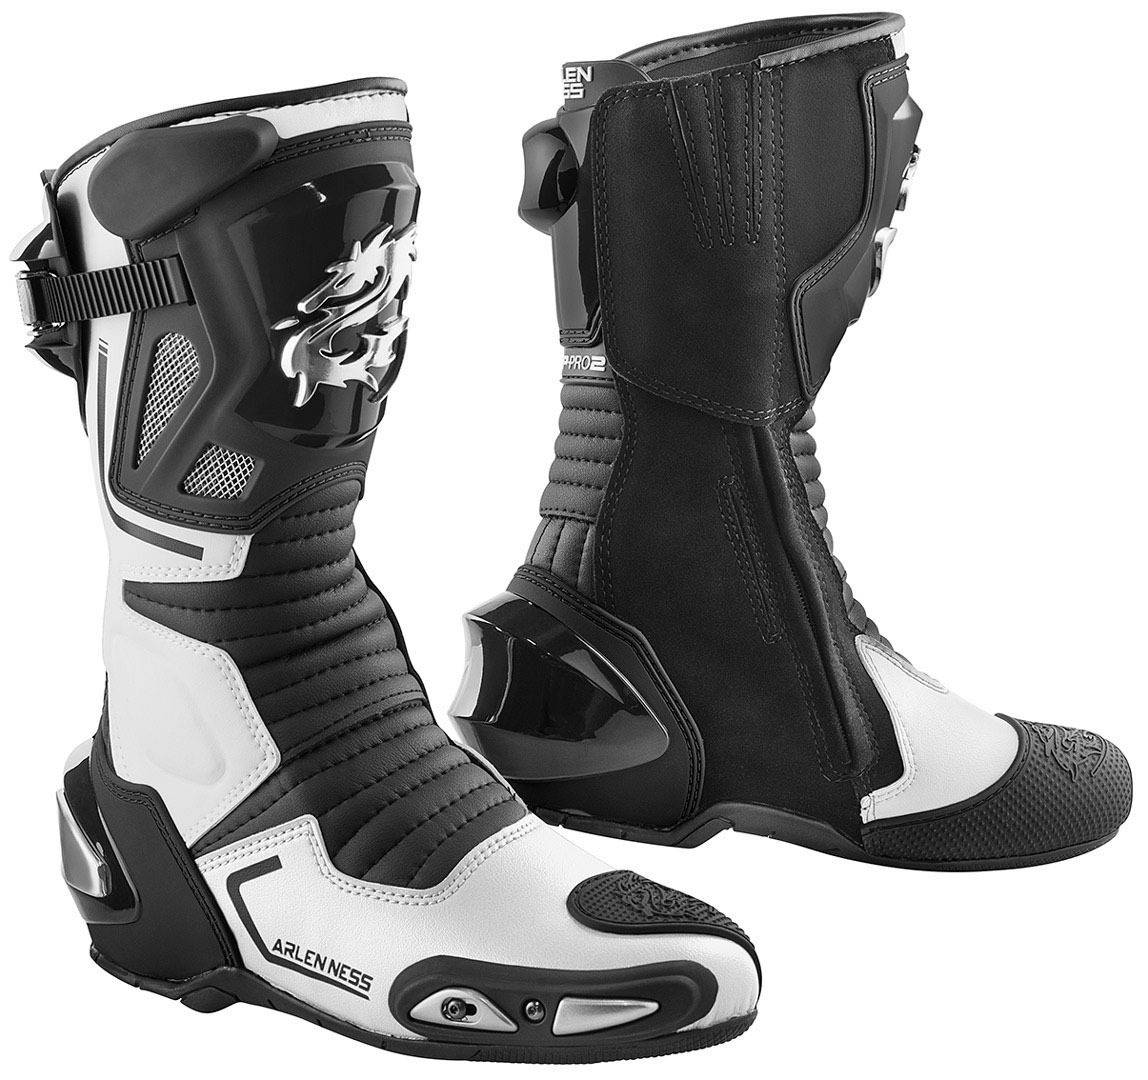 Arlen Ness Sugello Bottes de moto Noir Blanc taille : 37